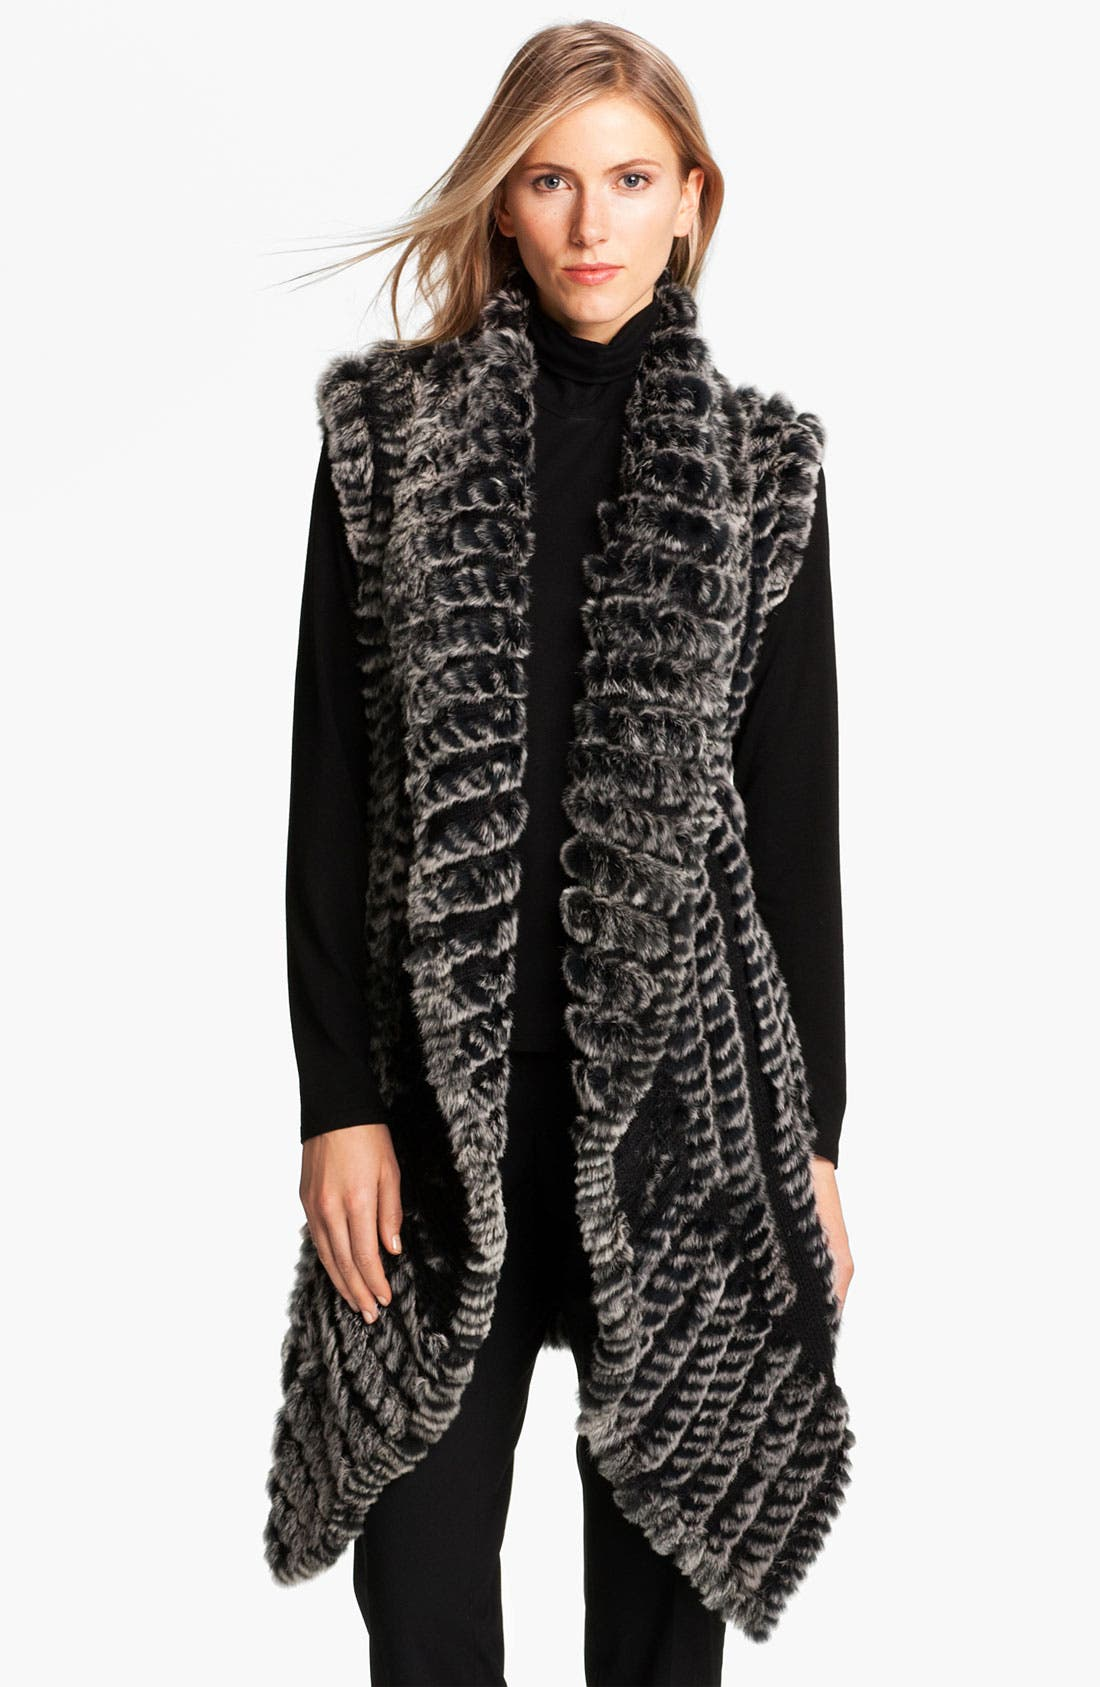 Alternate Image 1 Selected - Alberto Makali Knit & Genuine Rabbit Fur Vest